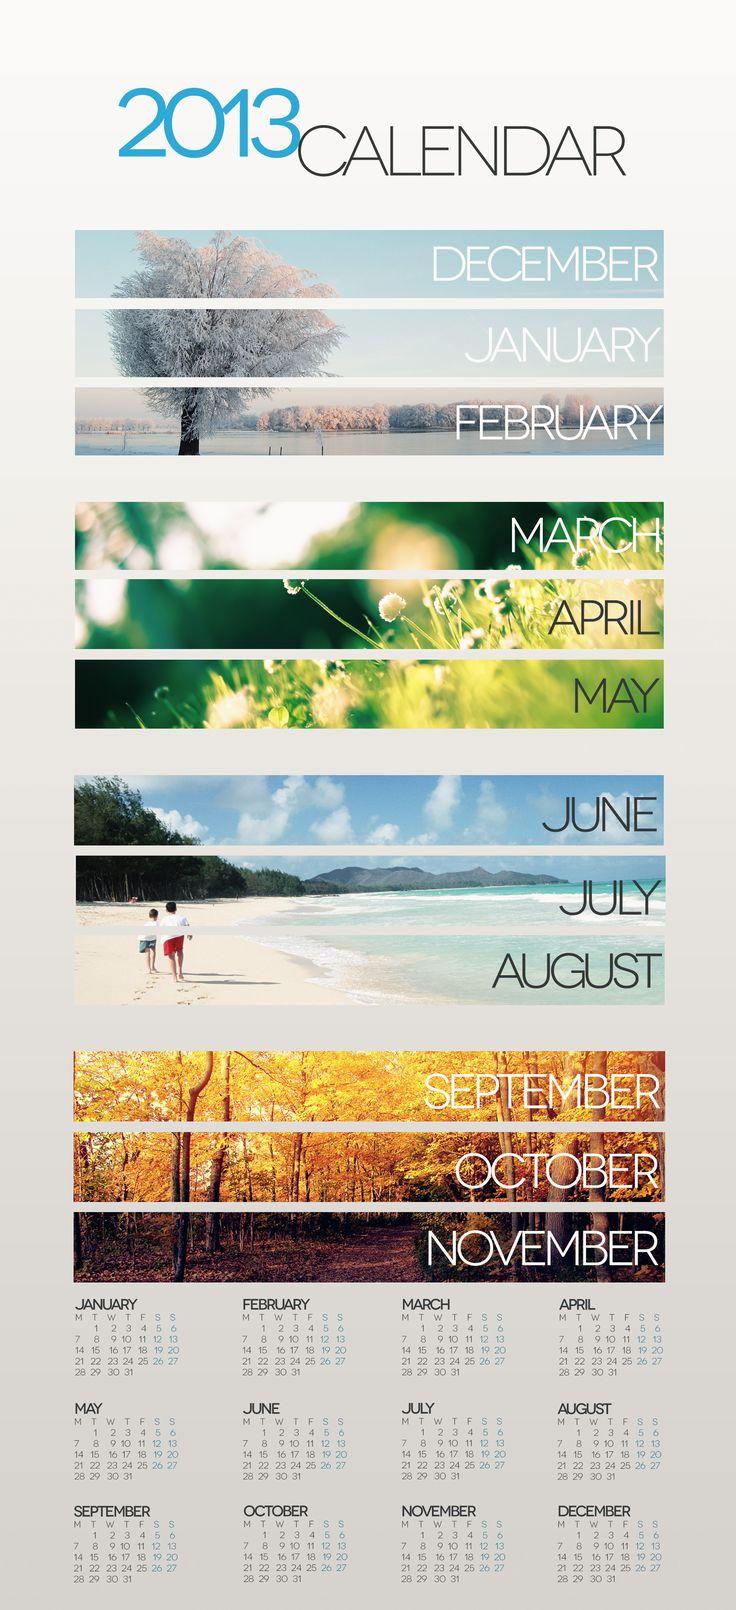 calendar designs - Google Search